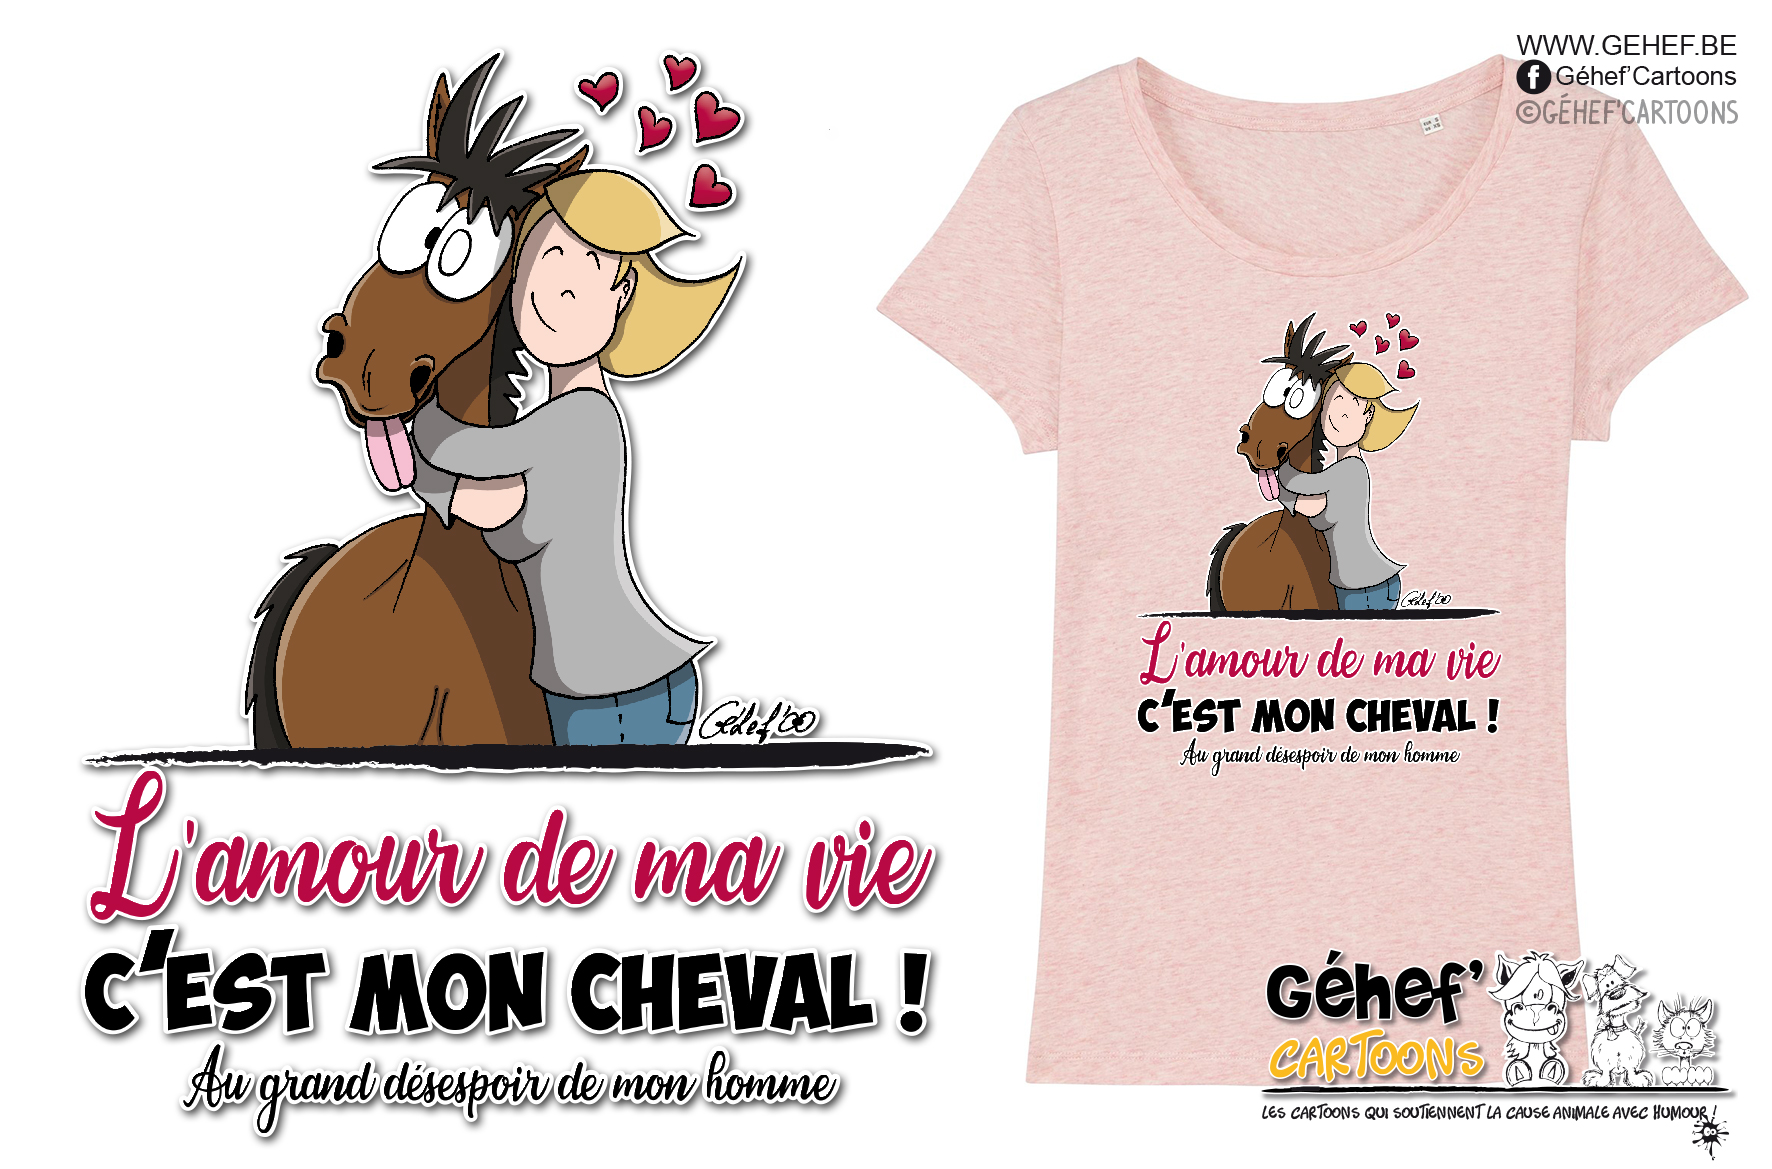 web-teeshirt-w-017---Amour-de-ma-vie-che